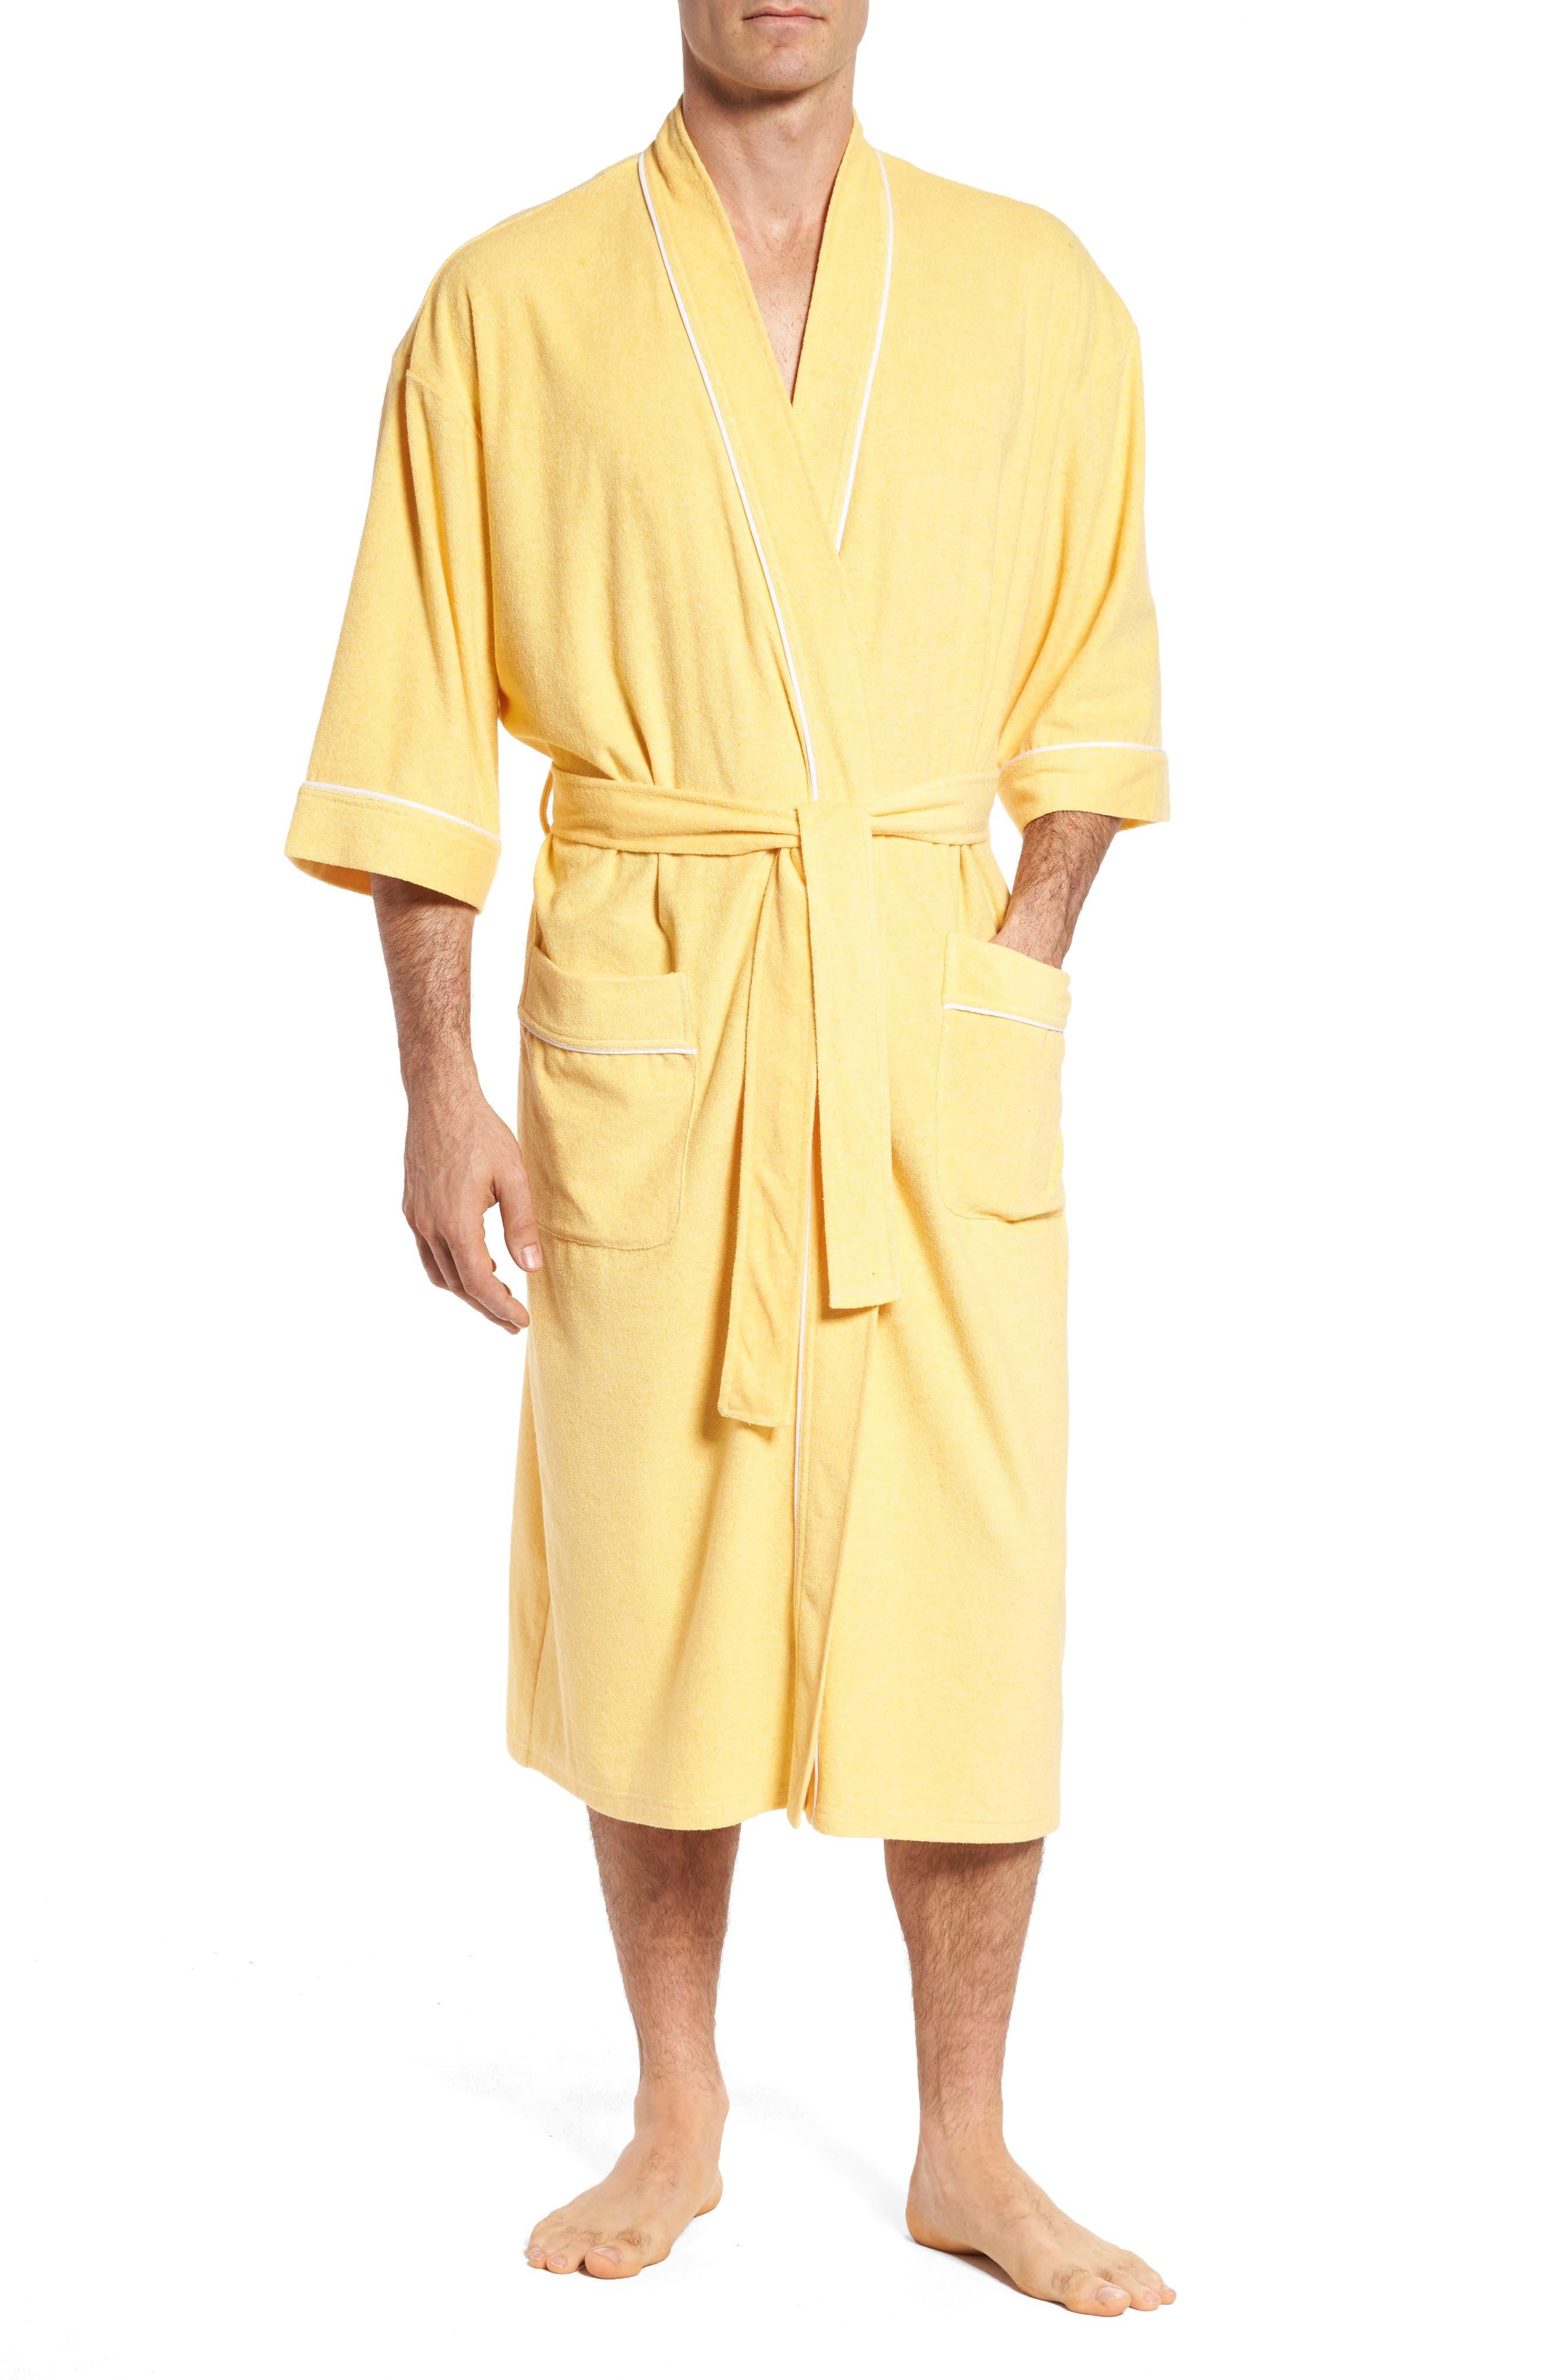 Kimono Cotton Blend Robe,                             Main thumbnail 1, color,                             Shine